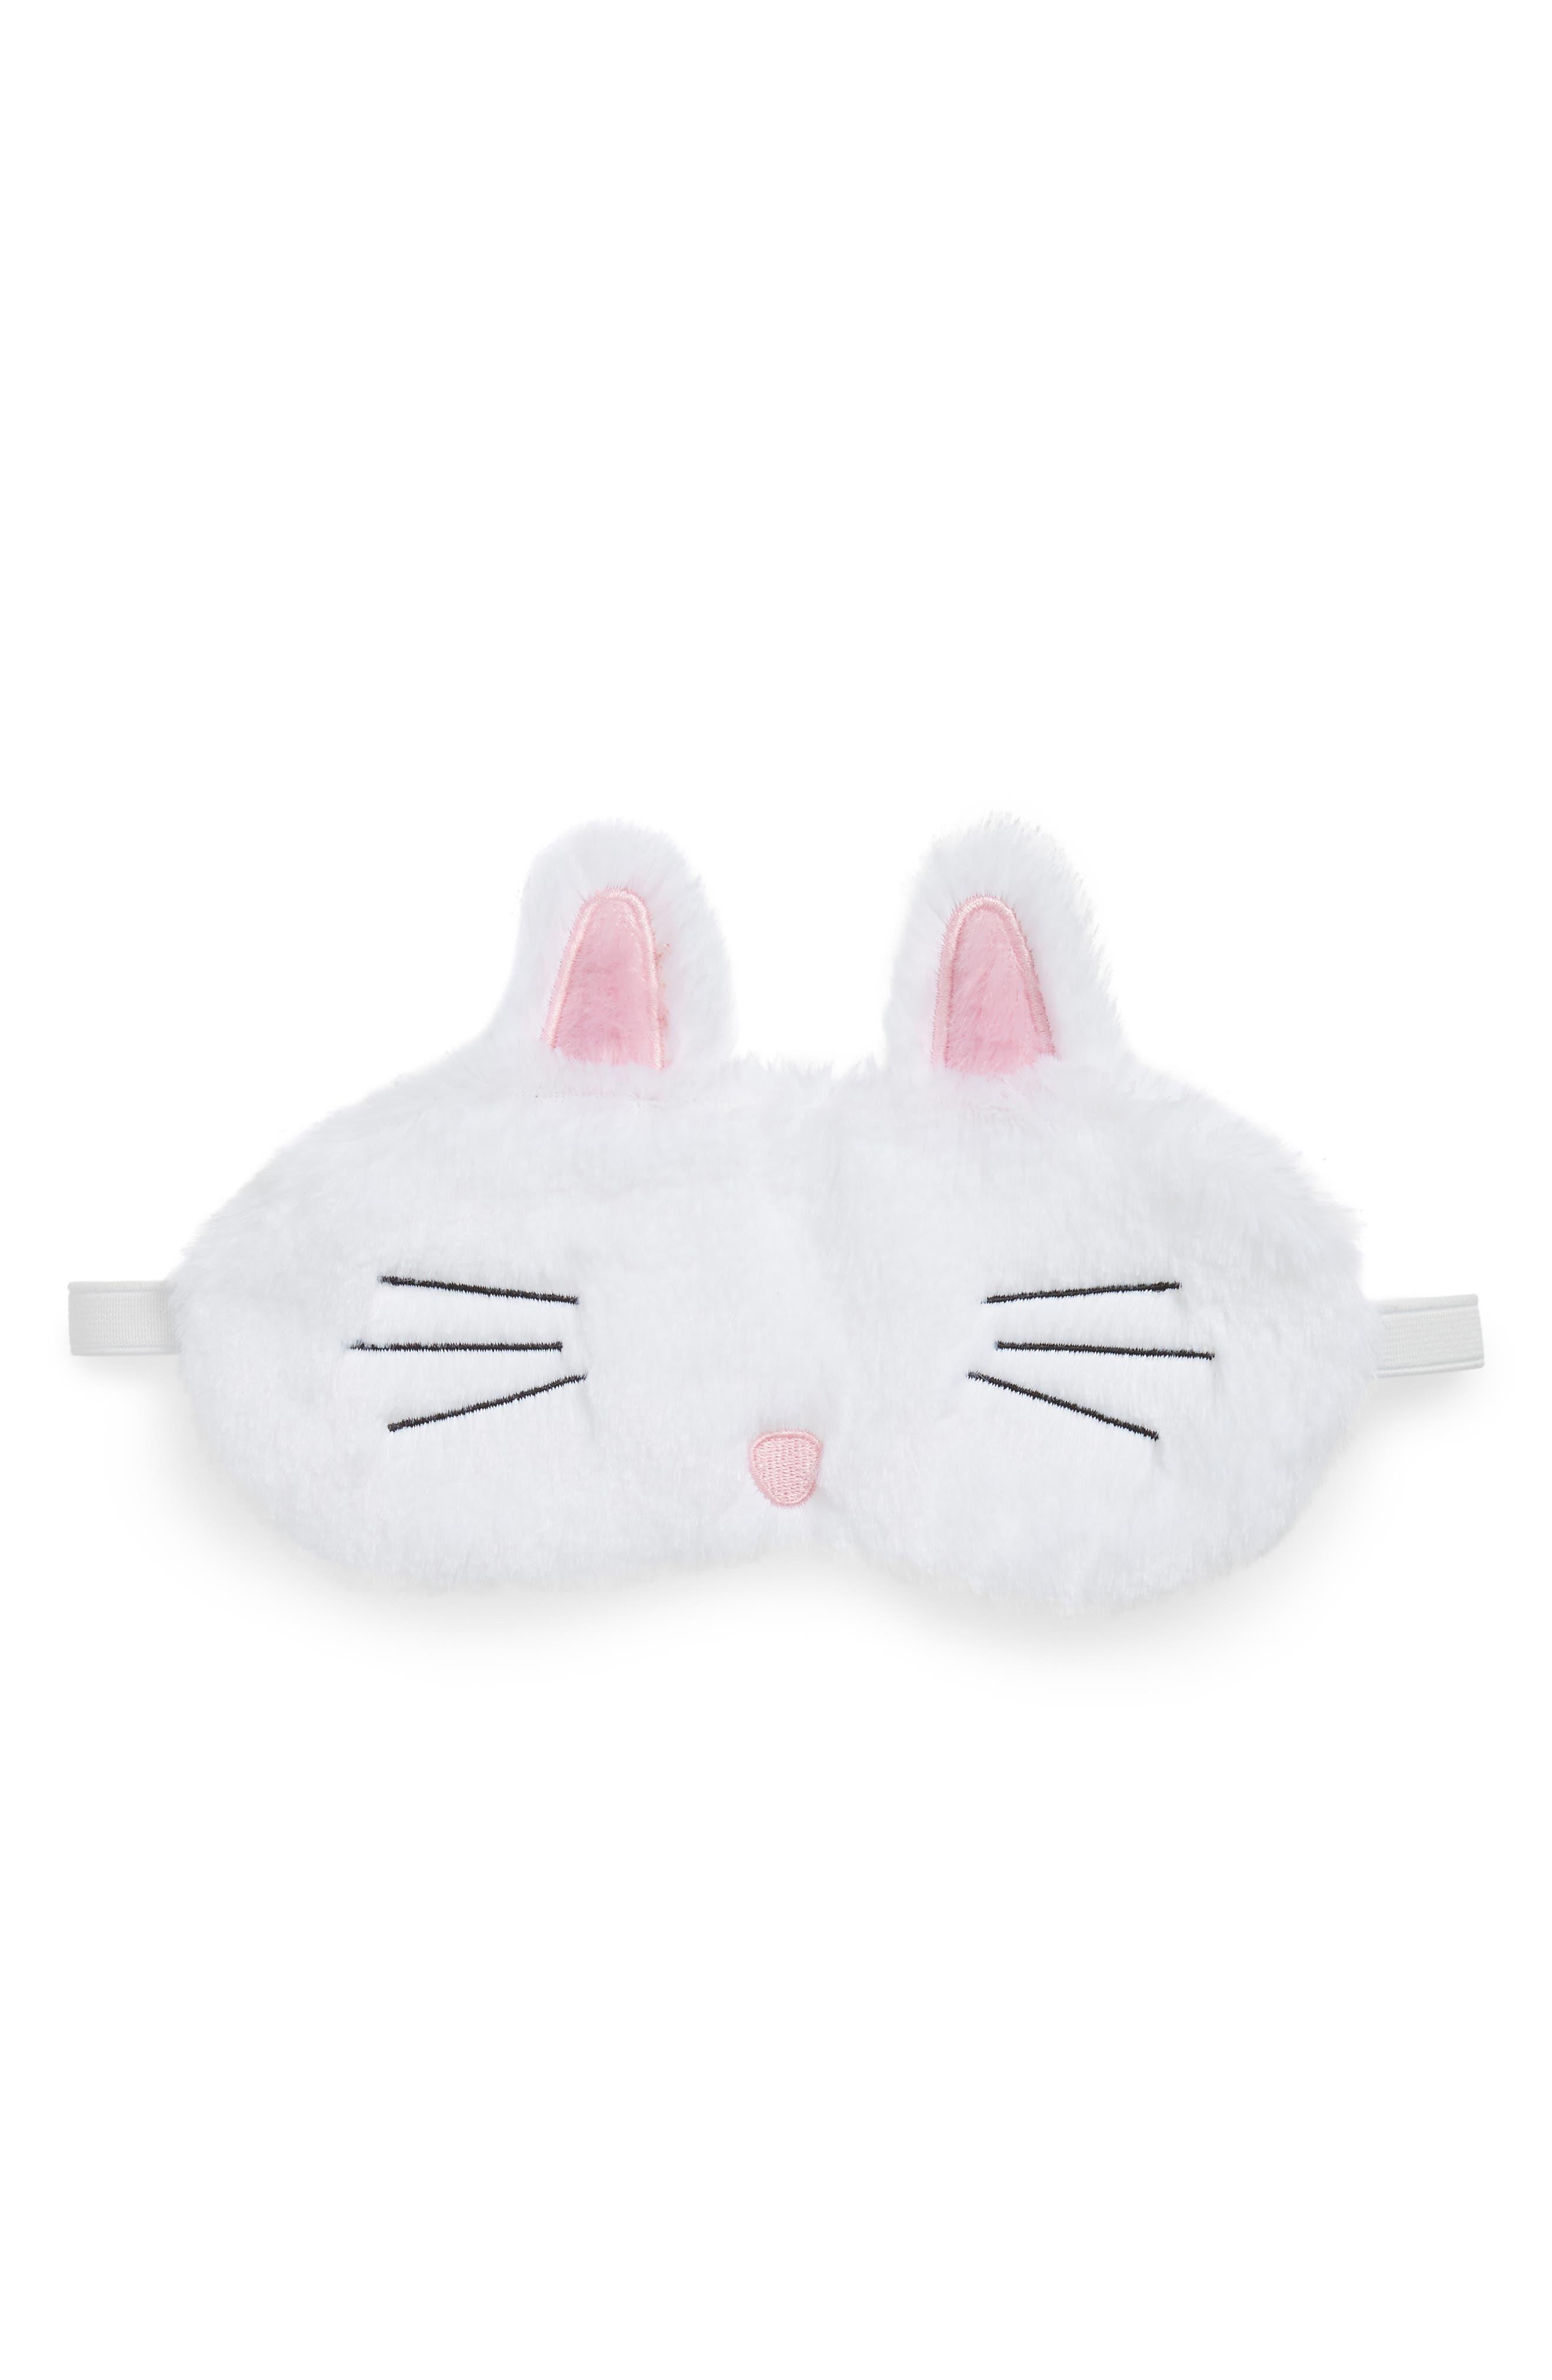 Bunny Spa Eye Mask,                             Main thumbnail 1, color,                             White